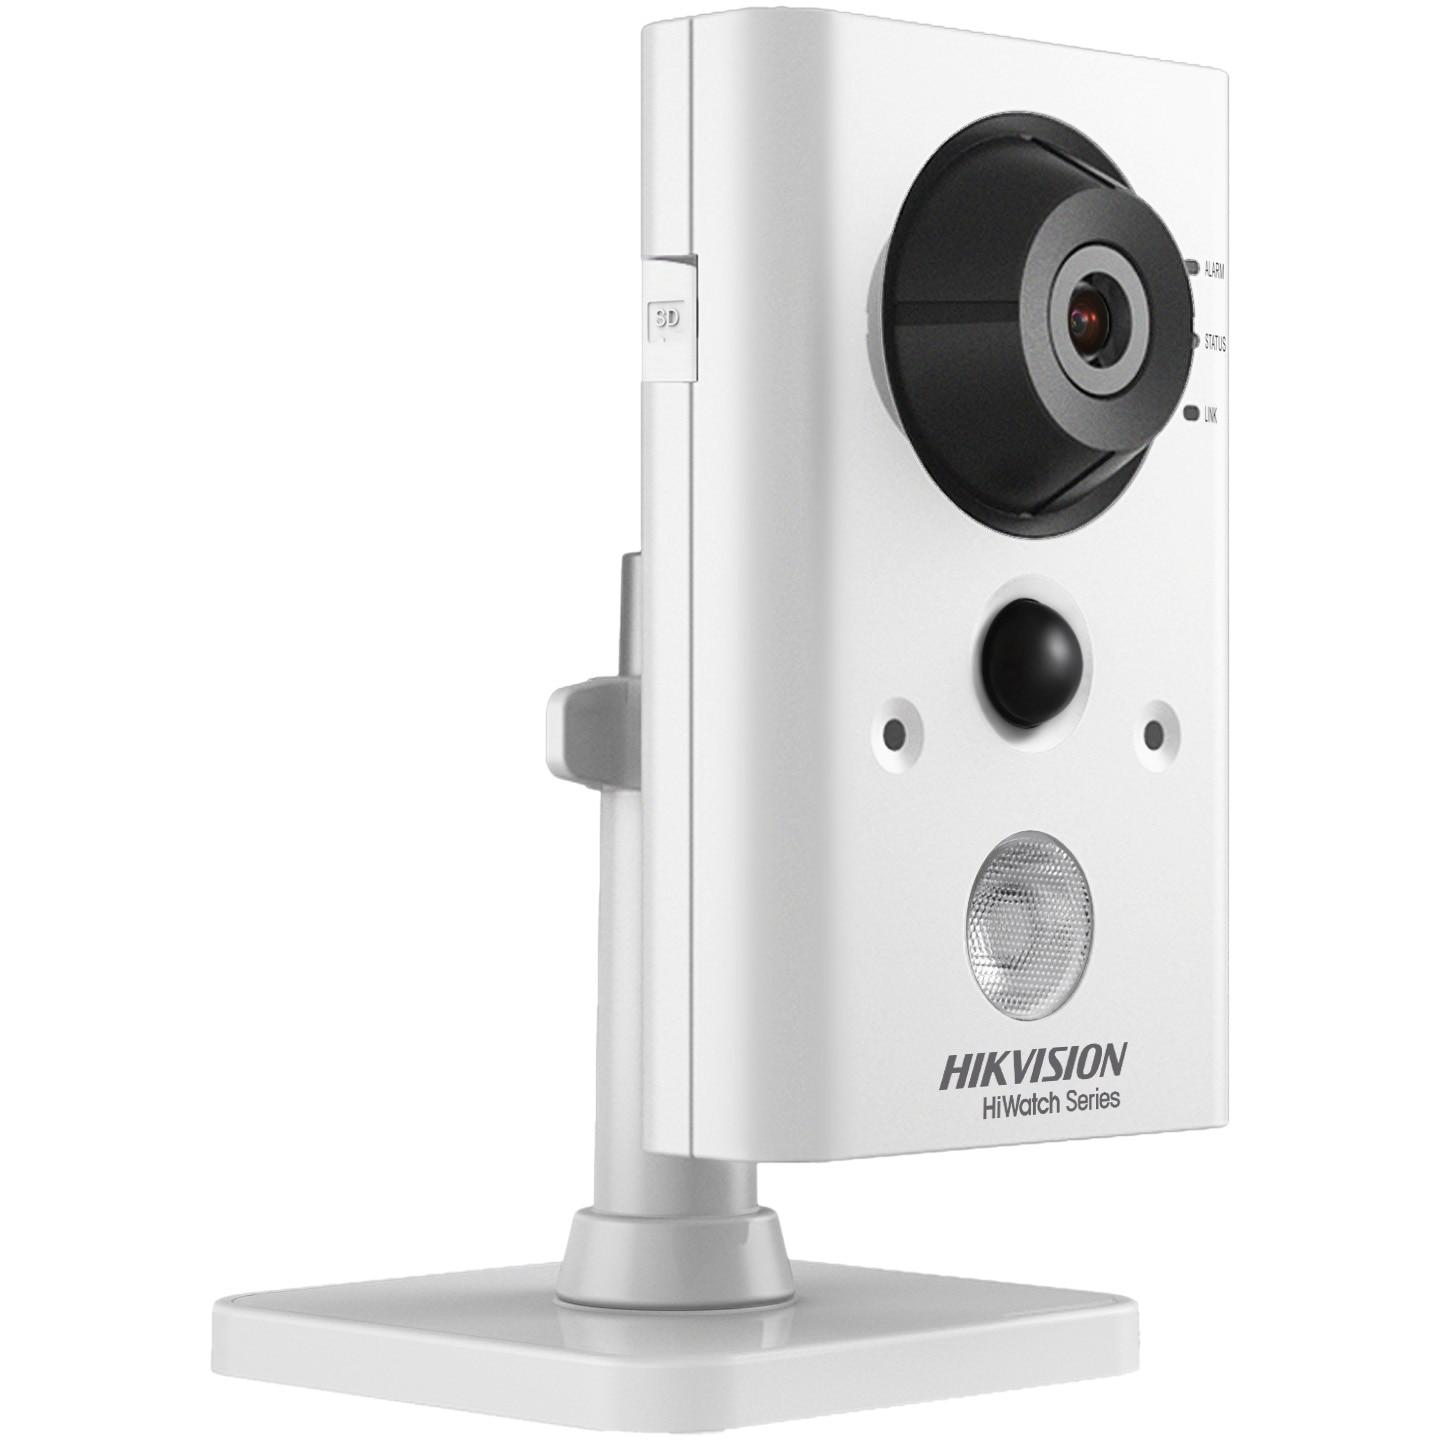 Fotografie Camera de supraveghere Hikvision HiWatch IP Cube, 2MP, lentila 2.8mm, WIFI, IR 10m, Microfon si difuzor incorporat, Mobile Monitoring, Alb/Negru